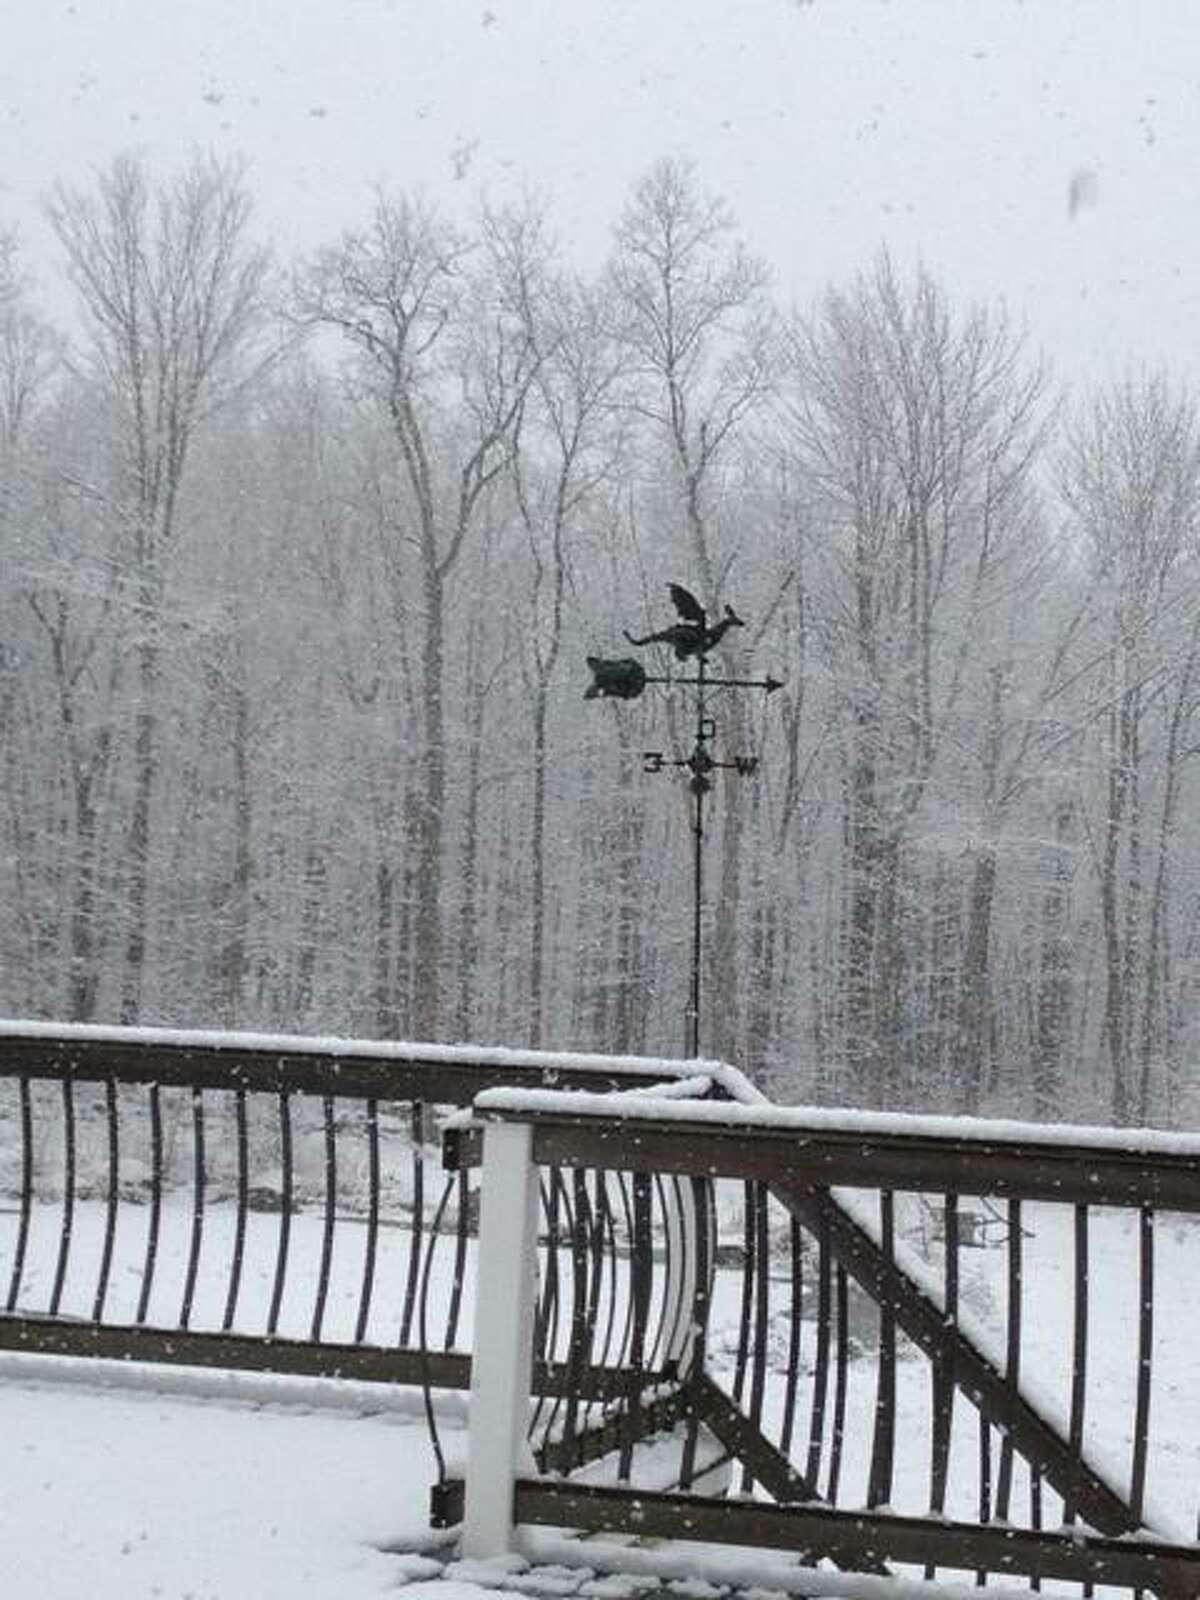 Torrington snowfall. Contributed photo/Jennifer Zordan